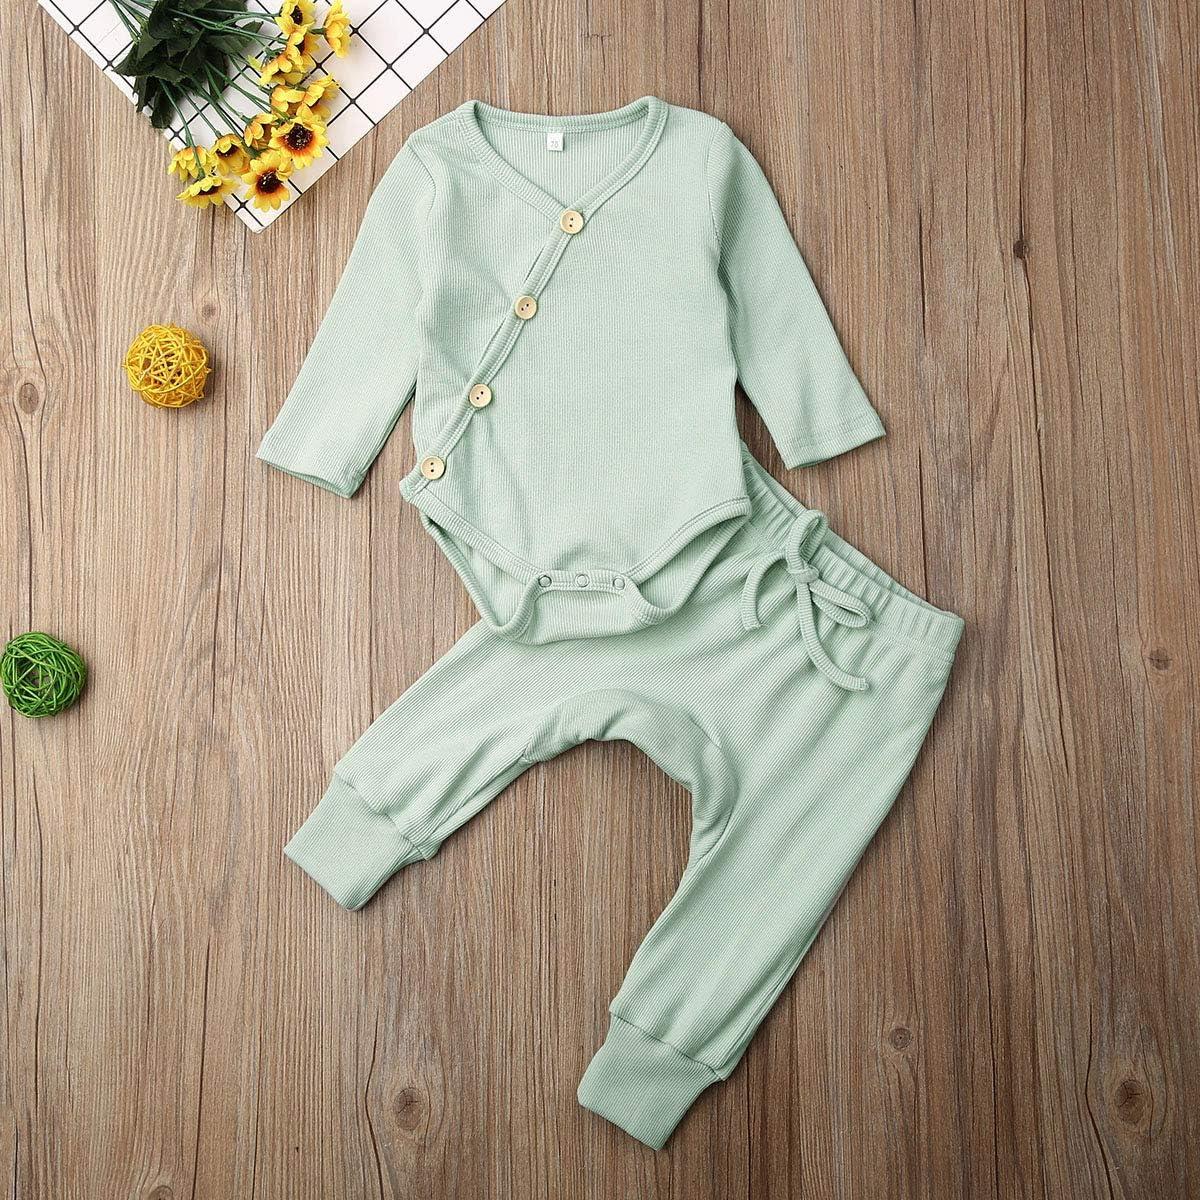 Pants Pajamas Set 0-18M LIjieganxin 2PCS Newborn Baby Unisex Side Button Type Ribbed Cotton Knit Jumpsuit